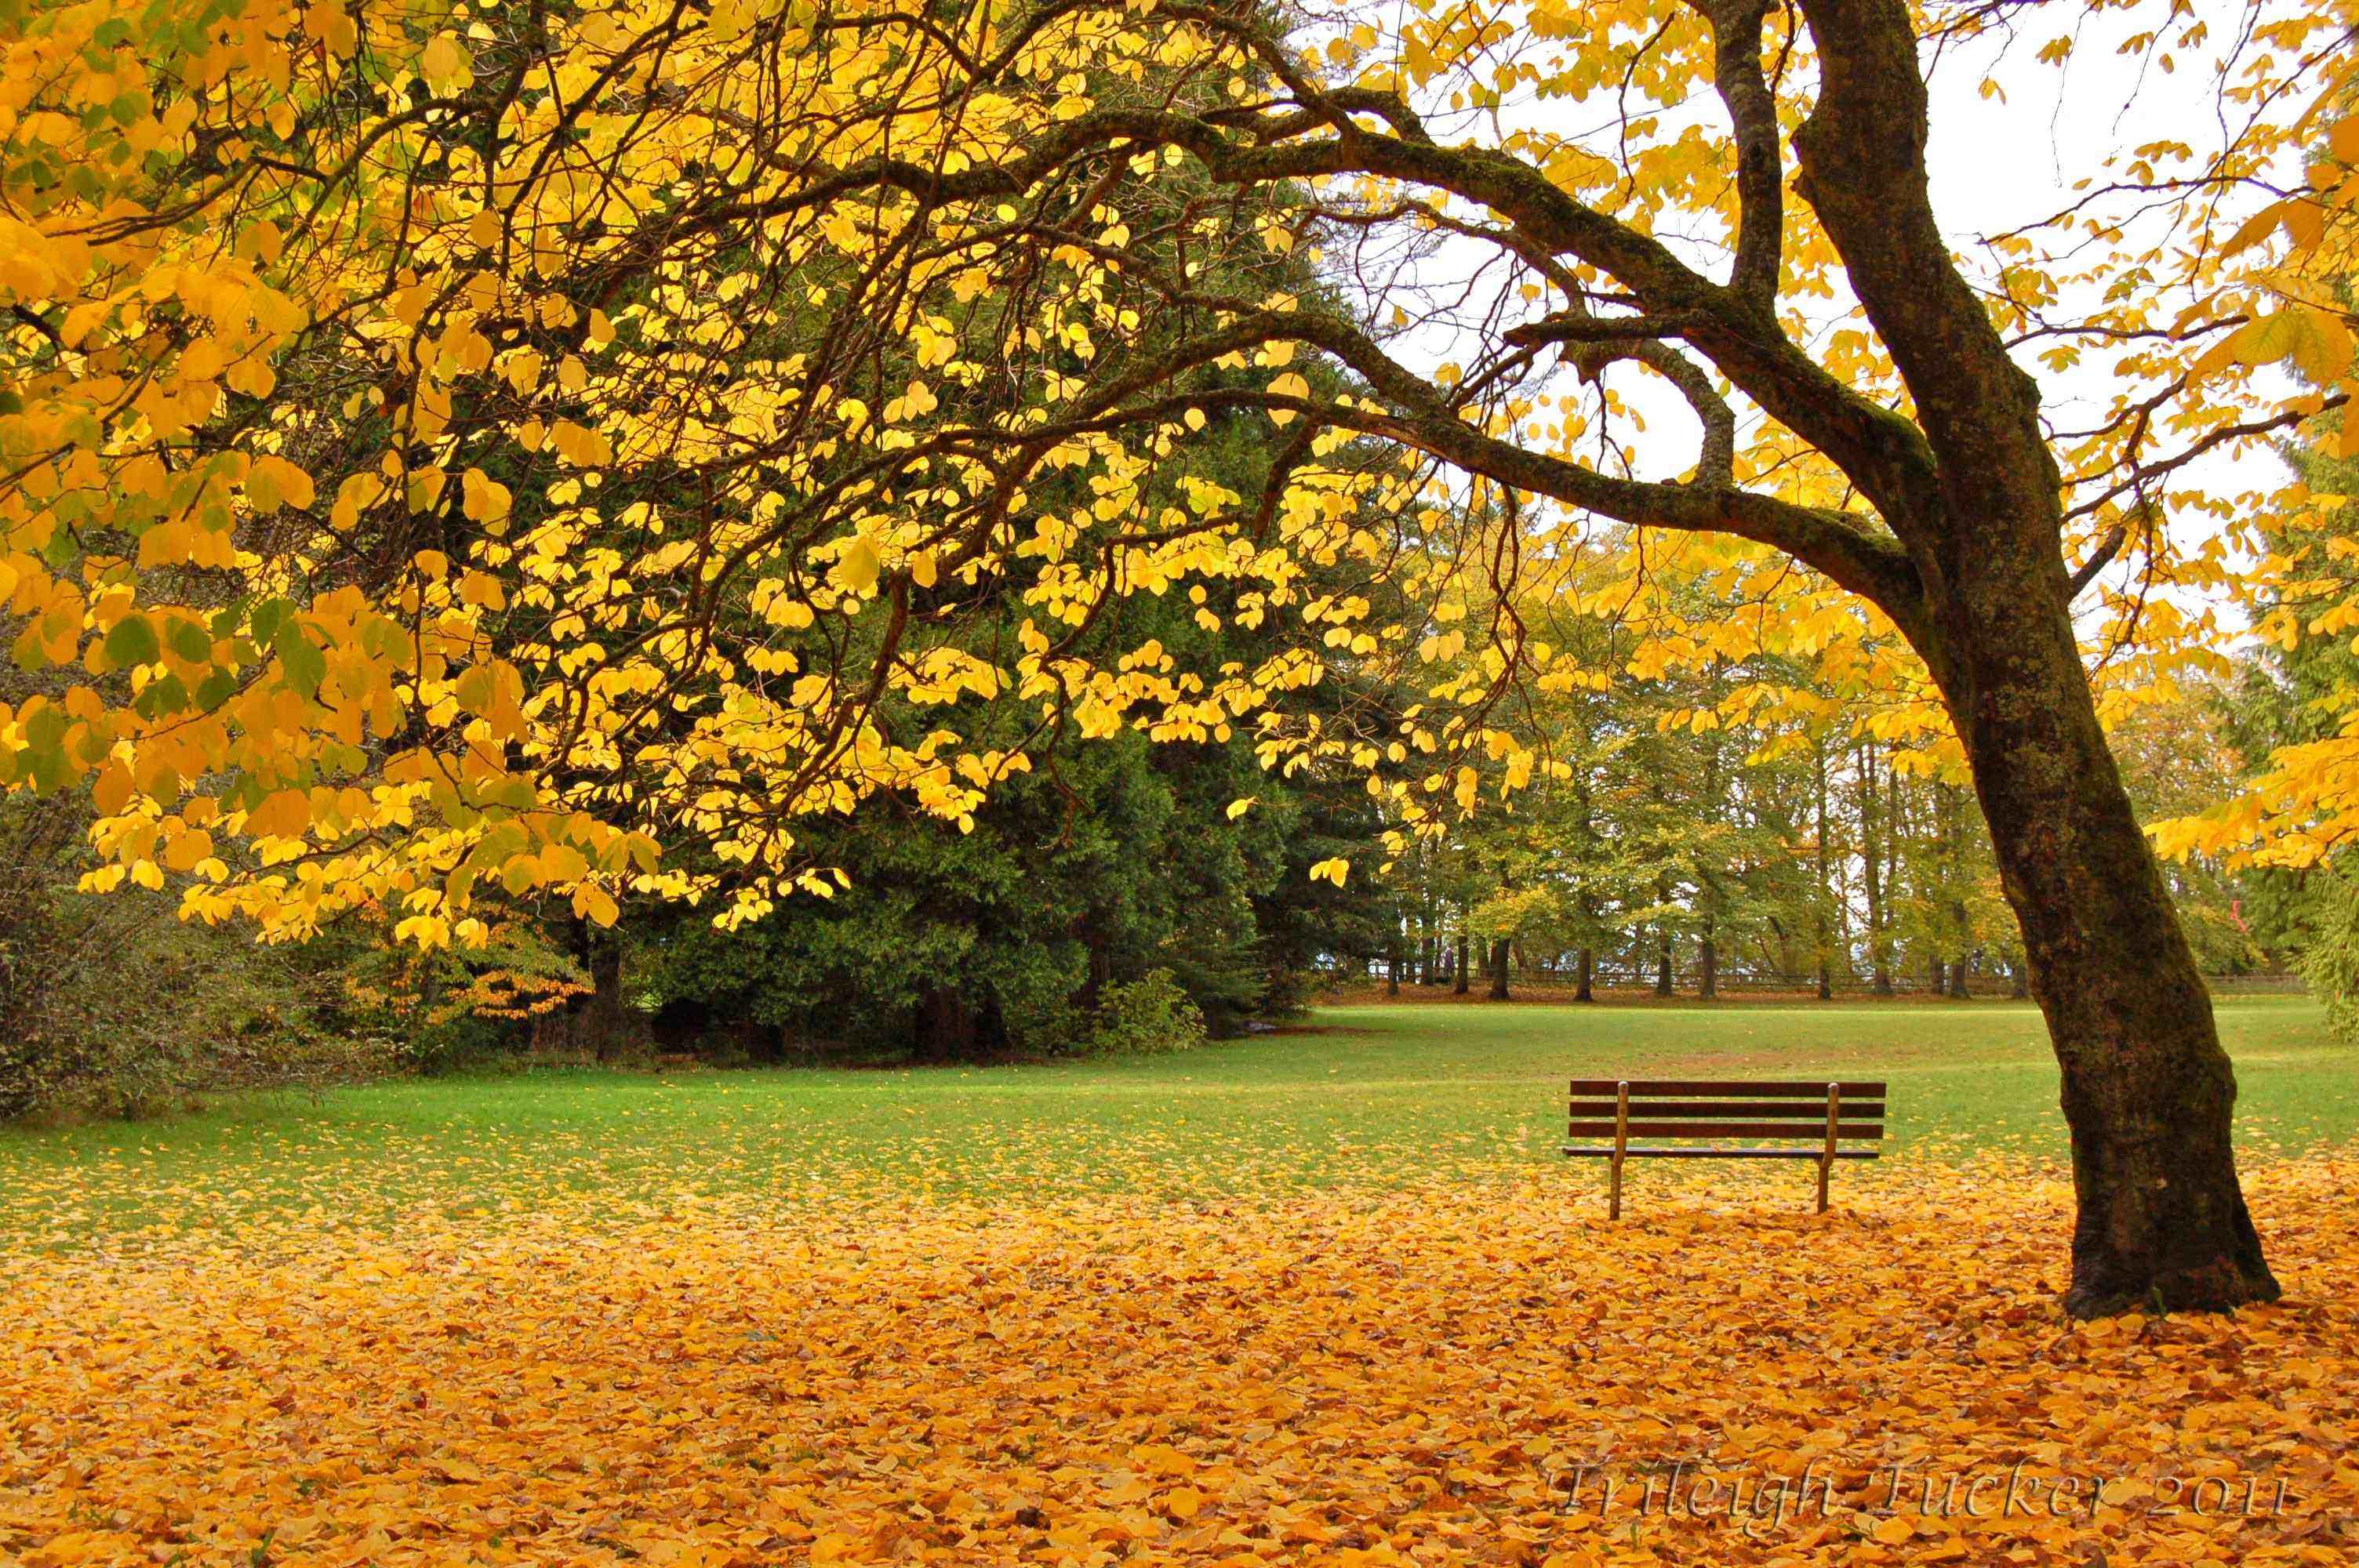 autumn | Trileigh Tucker